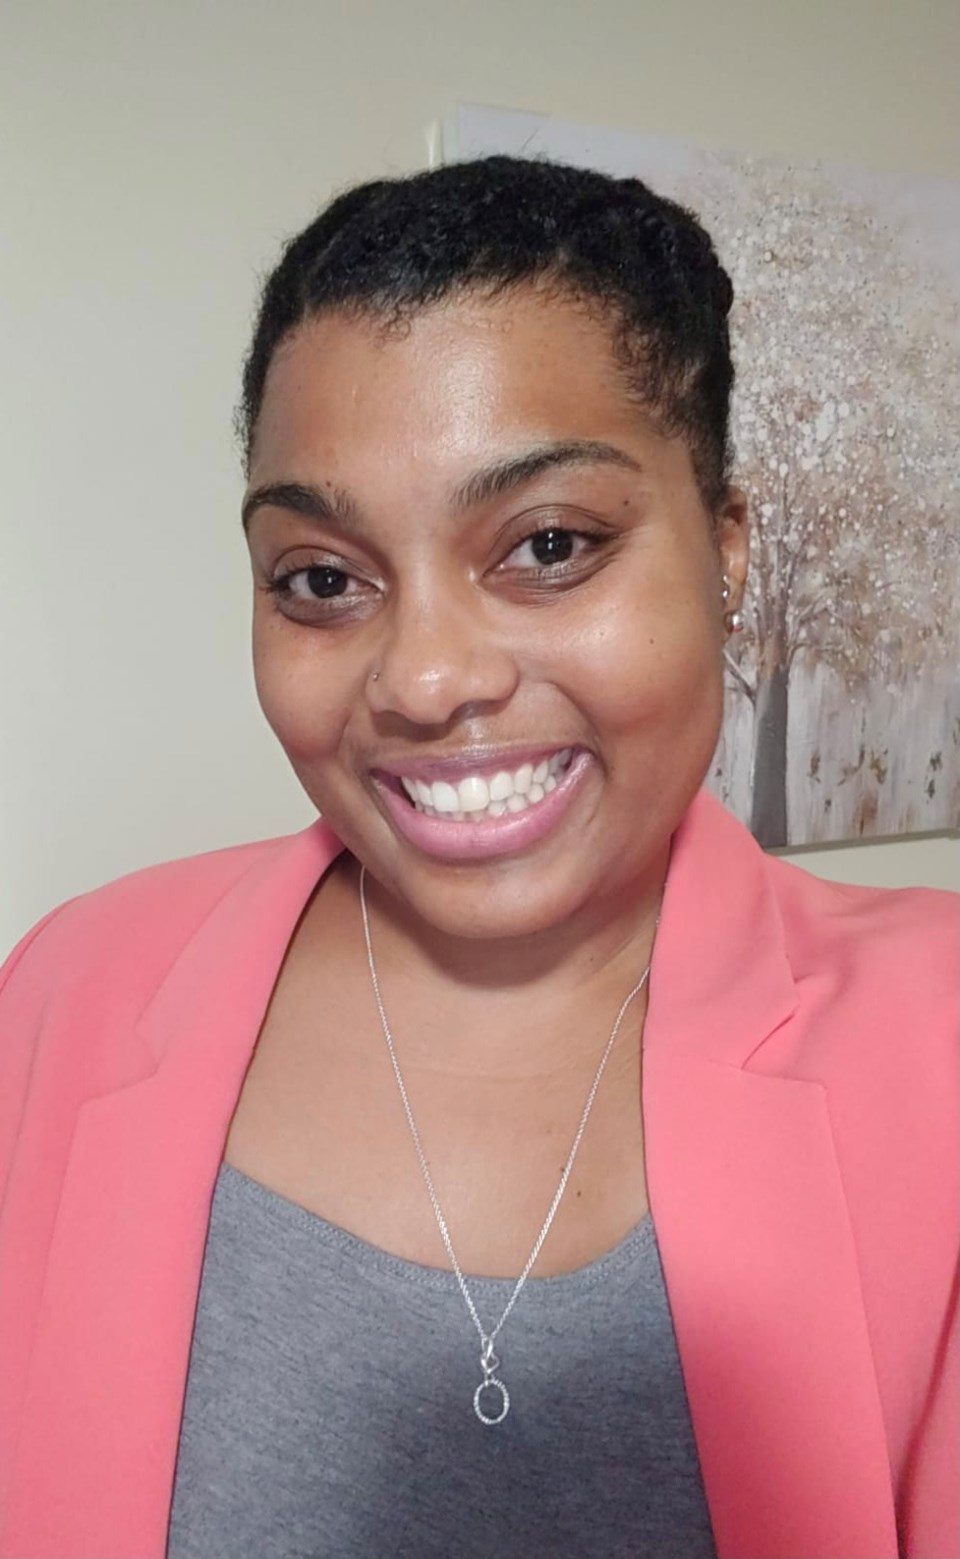 7. Malissa Bryan, Founder of Rainbow Diversity Institute. Photo by Malissa Bryan